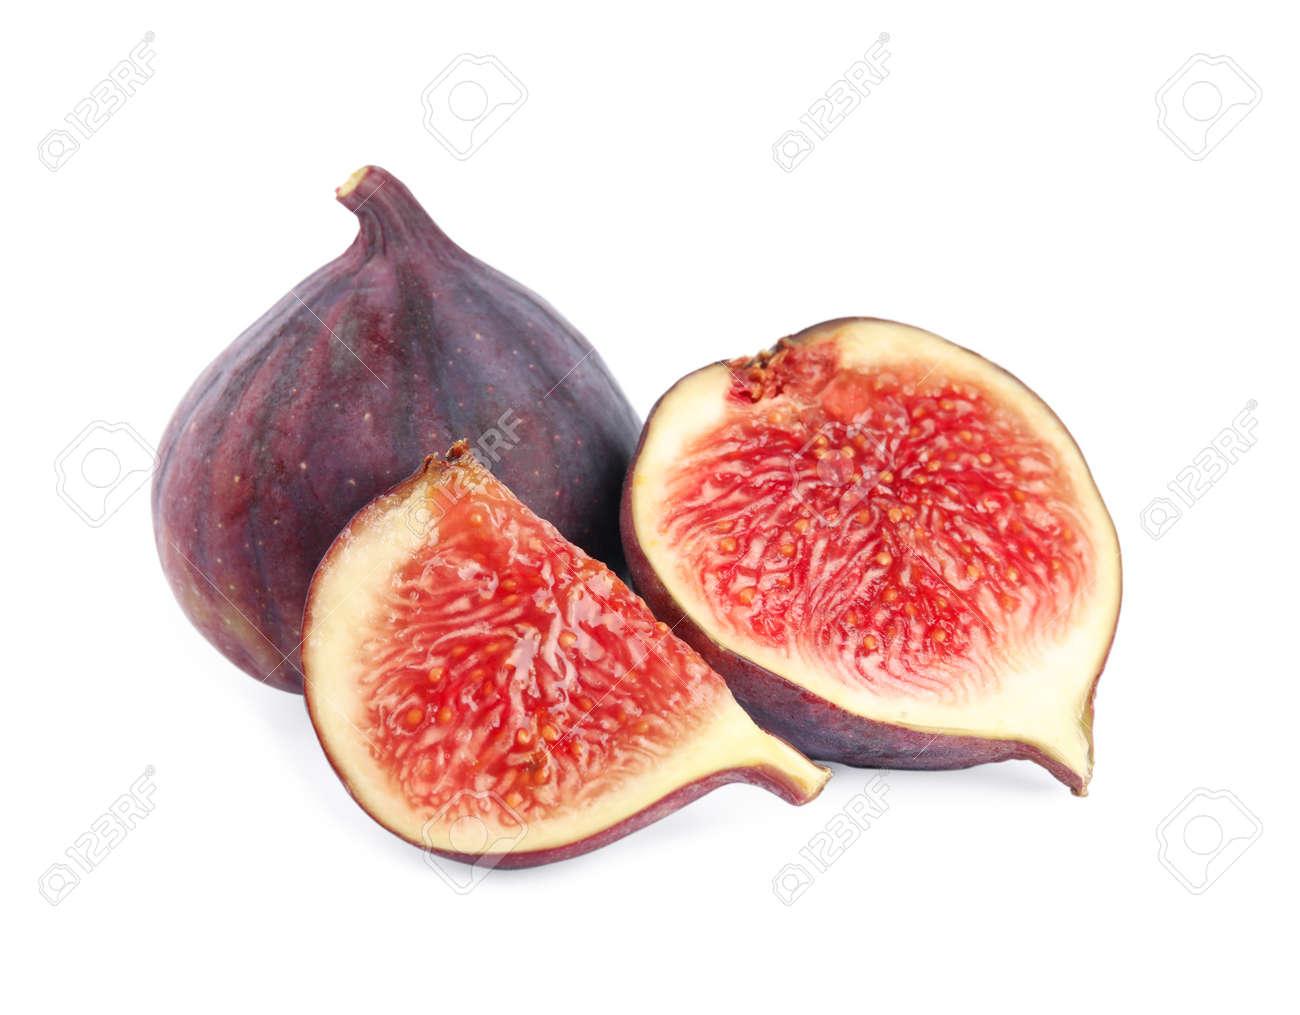 Tasty fresh fig fruits on white background - 130428135